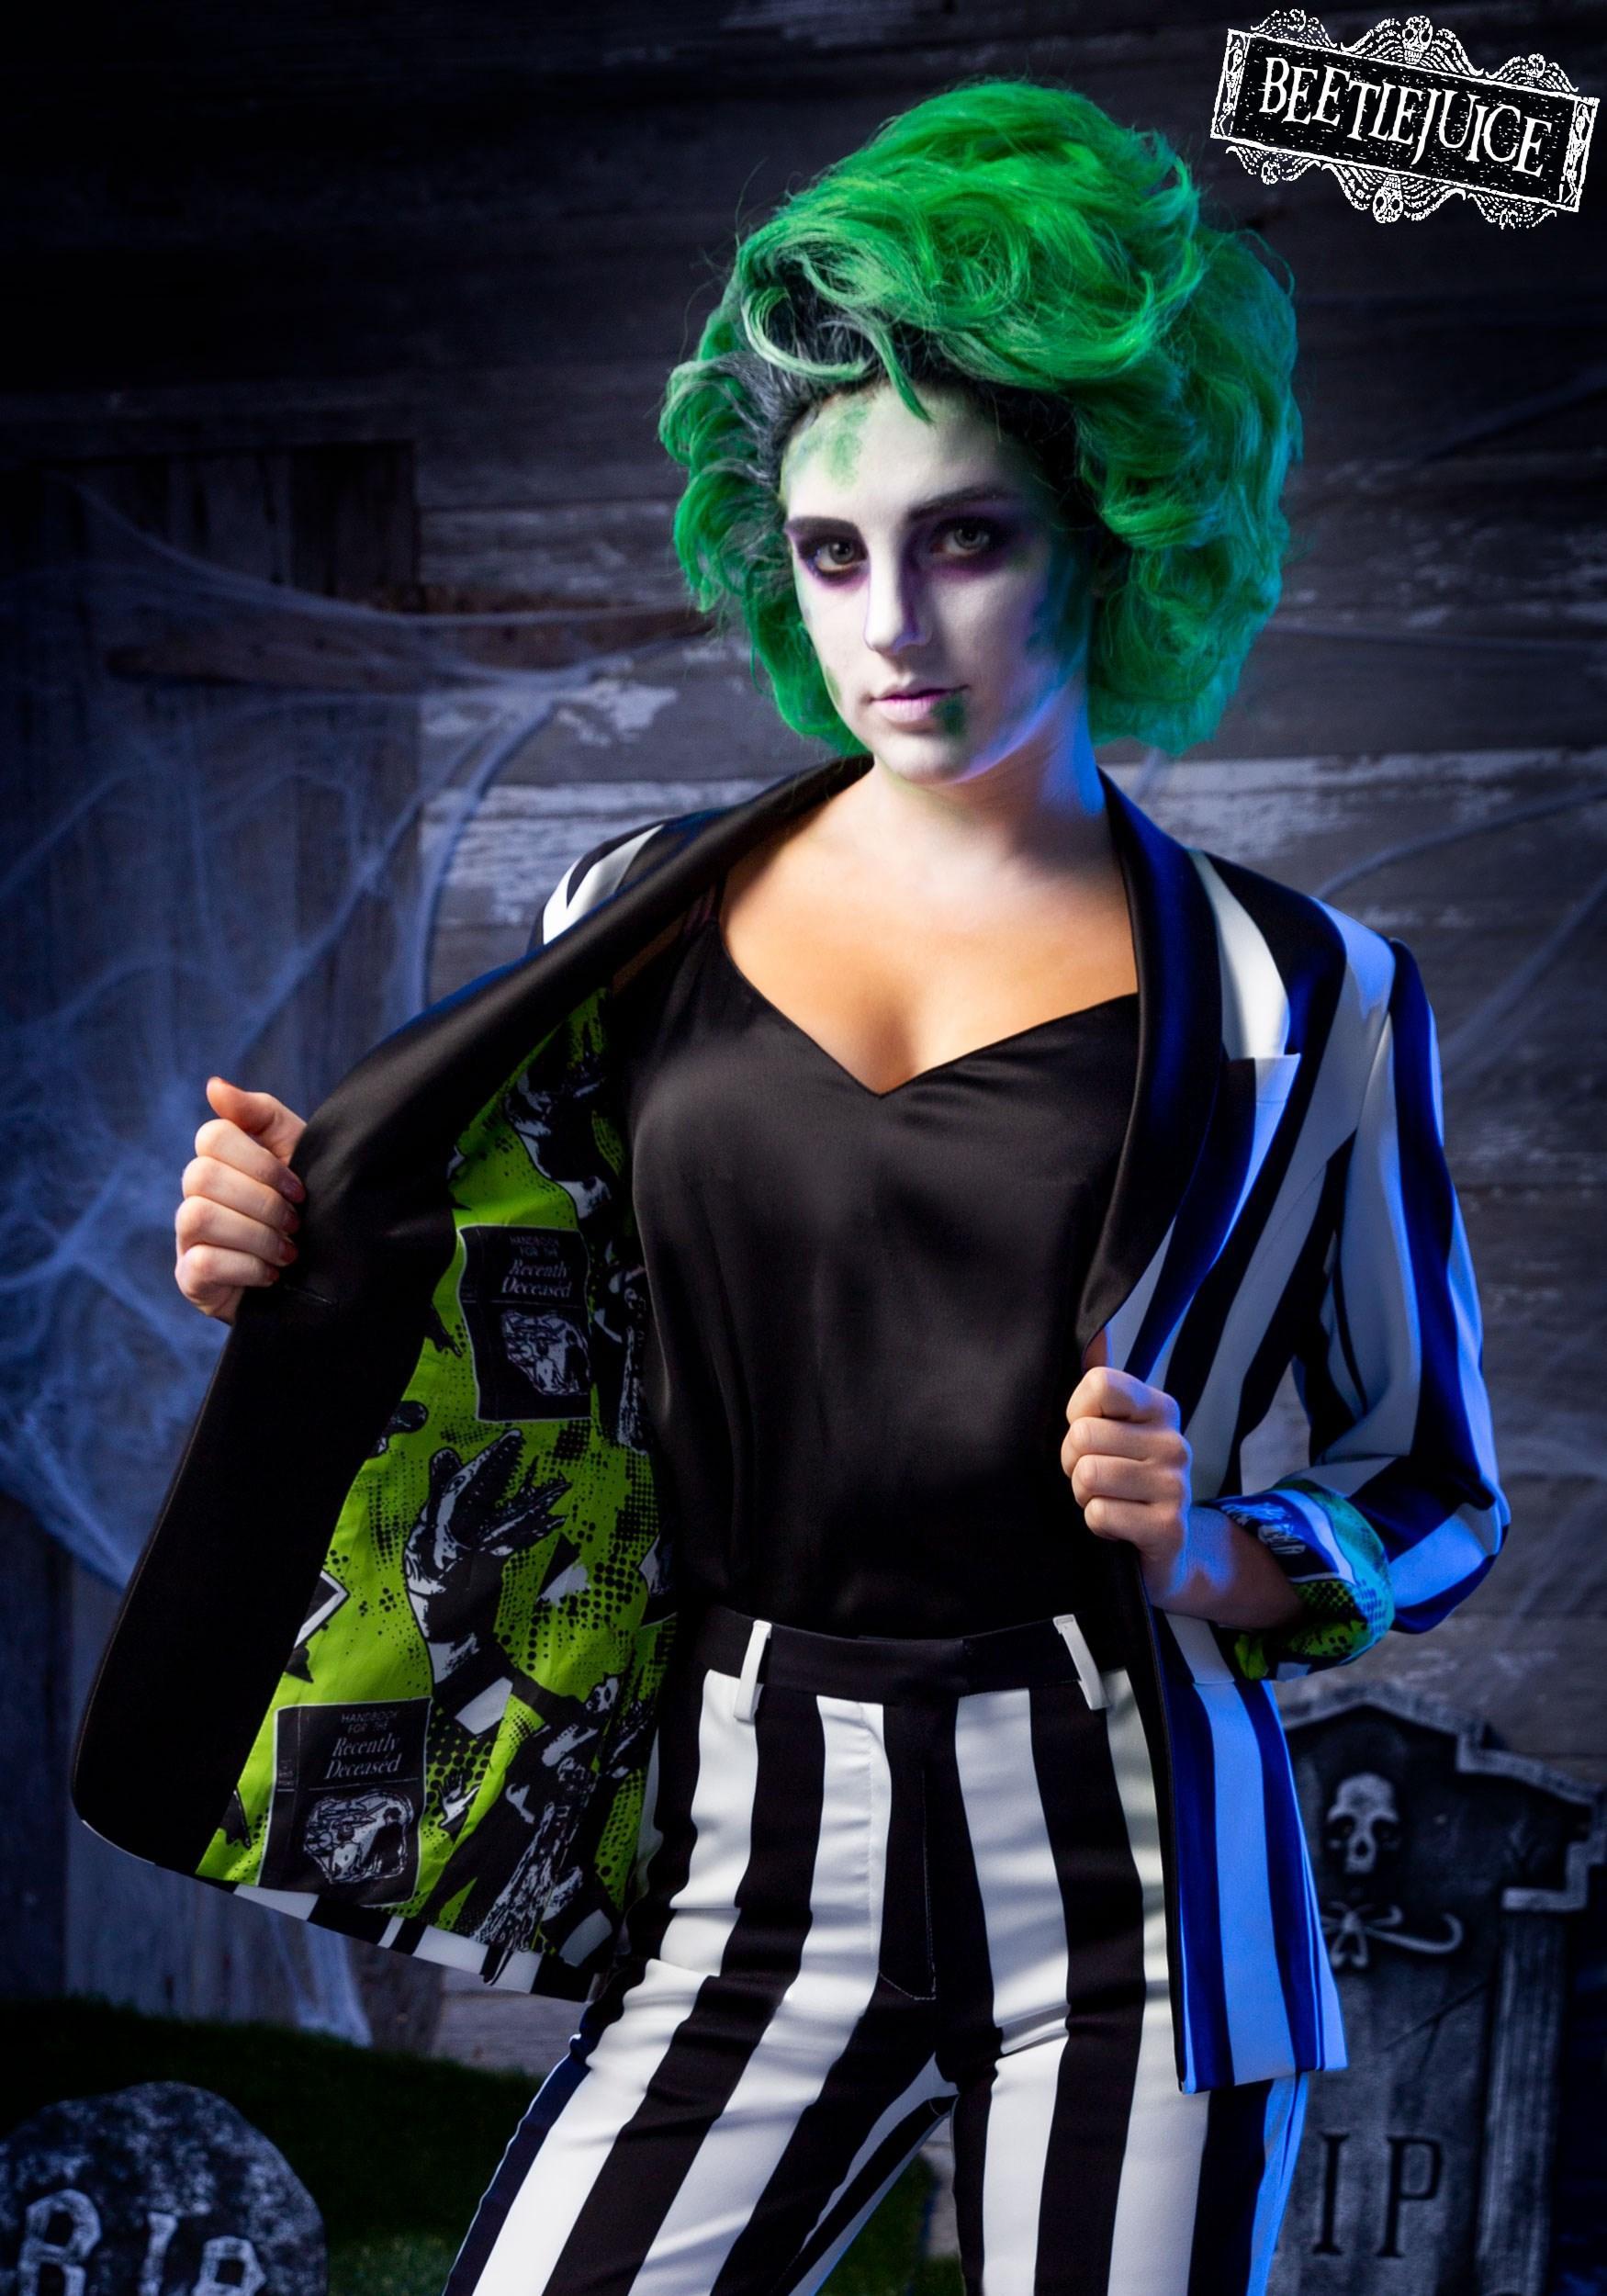 Halloween/Beetlejuice